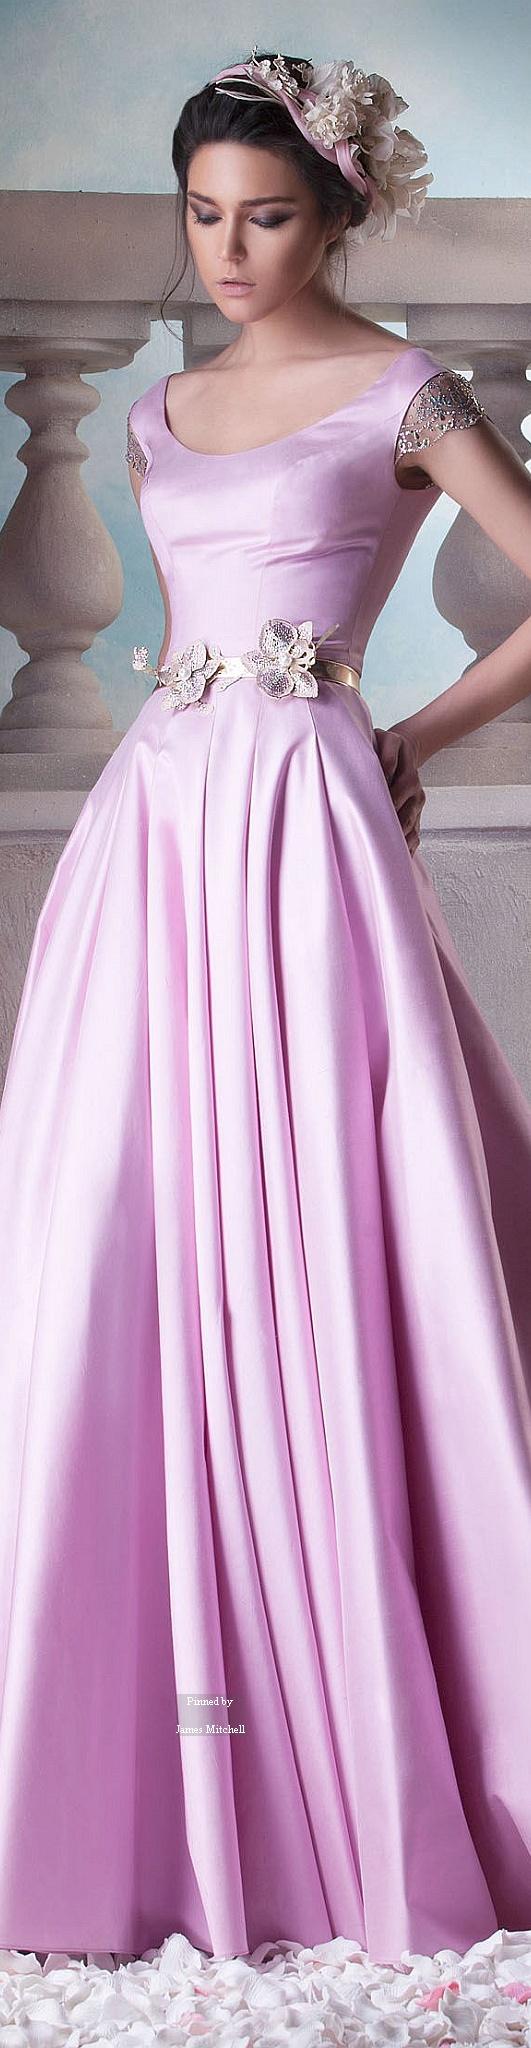 Hanna Touma Couture Spring-summer 2015 | wedding | Pinterest ...